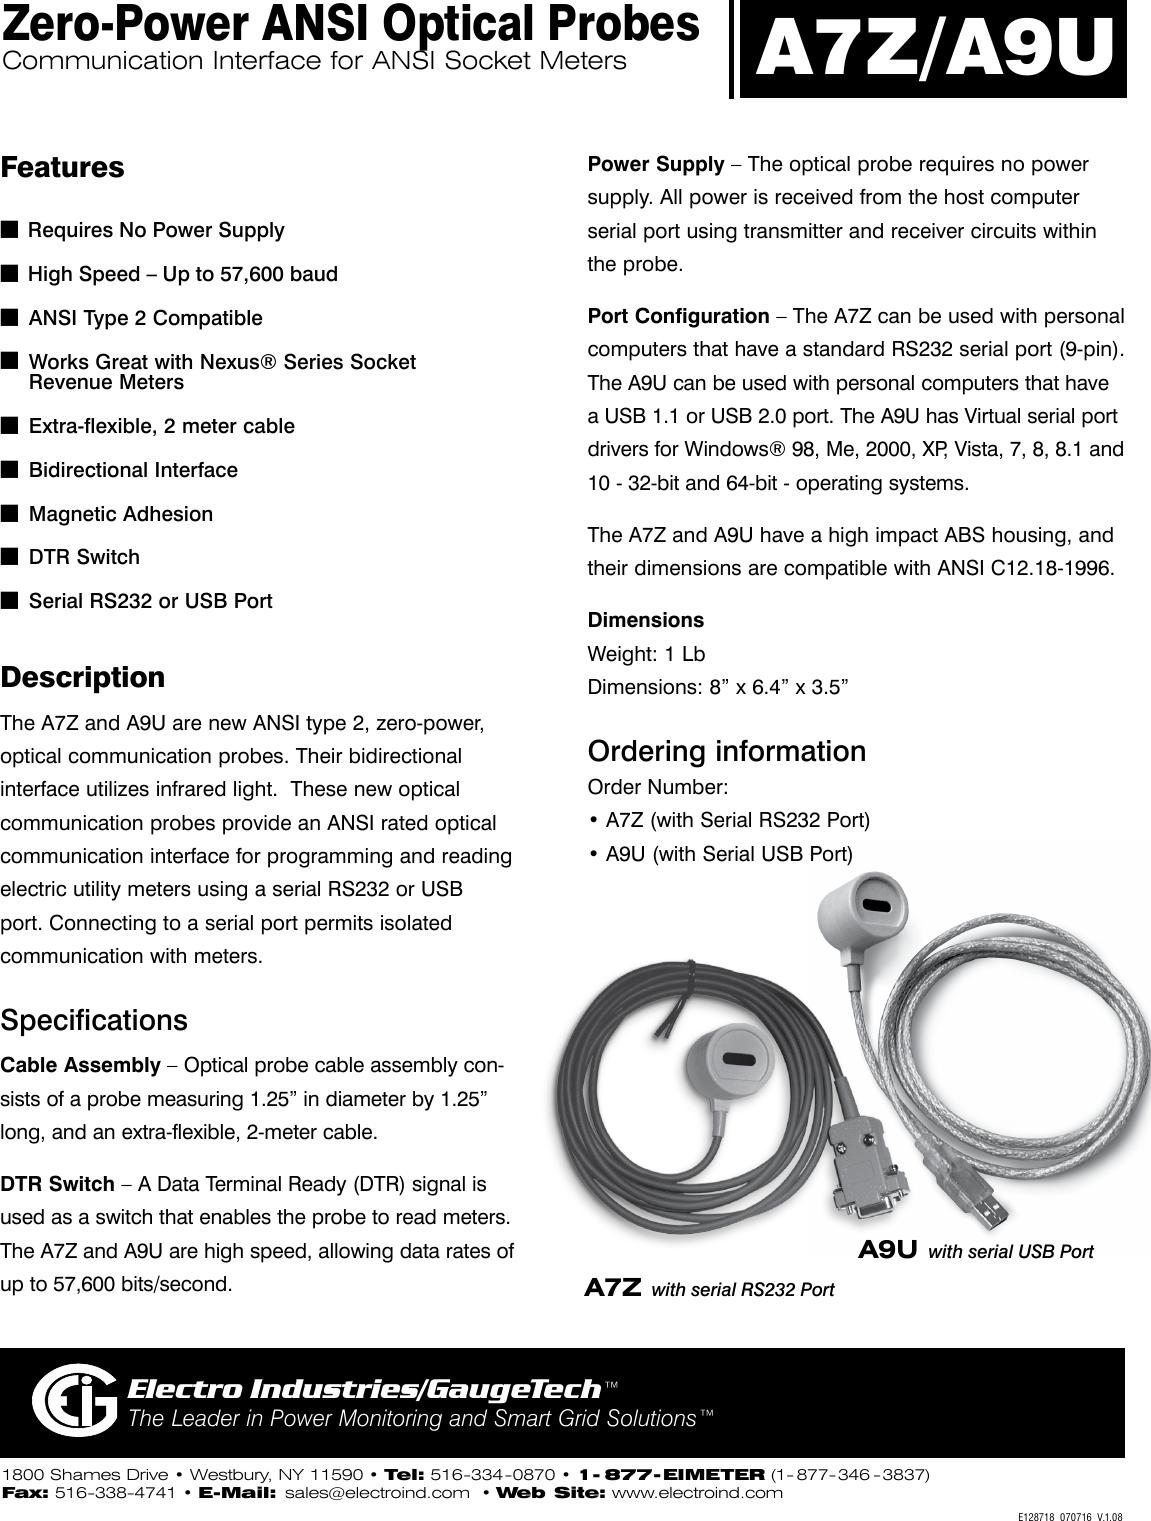 A7Z/A9U Brochure V 1 08 A7Z And A9U ANSI Optical